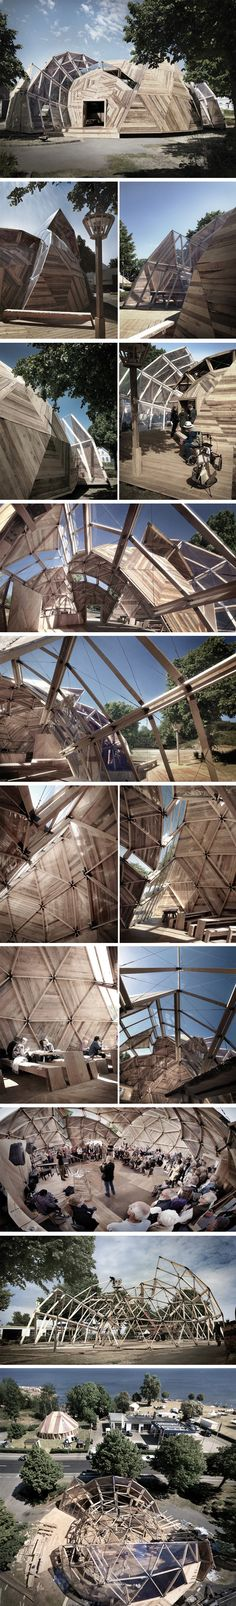 Incredible wooden geodesic dome. Peoples Meeting Dome par Kristoffer Tejlgaard & Benny Jepsen - Journal du Design